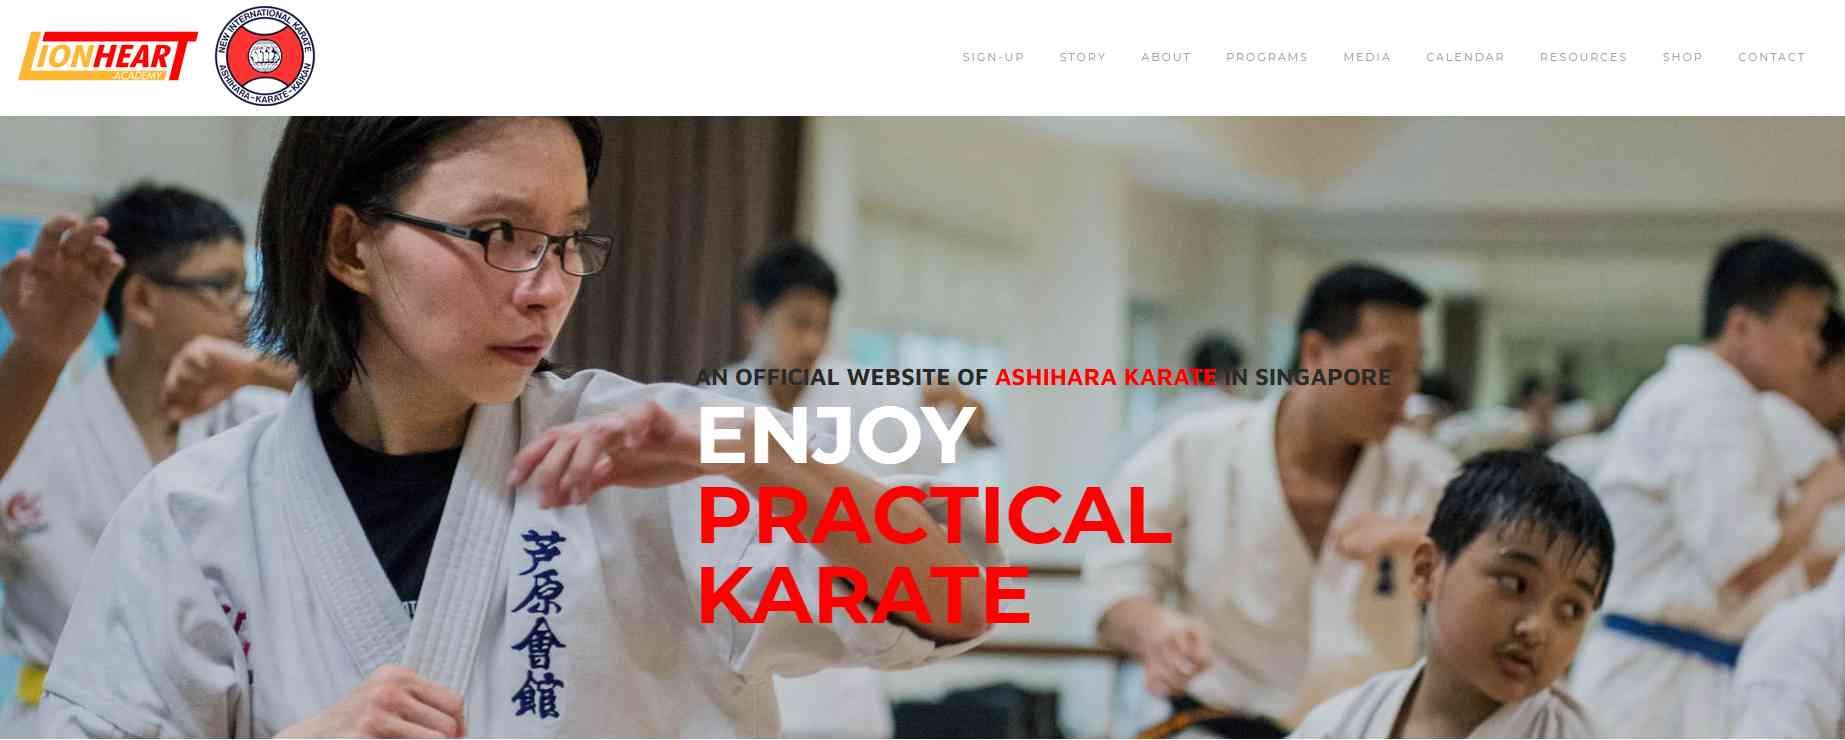 Ashihara Top Karate Classes in Singapore